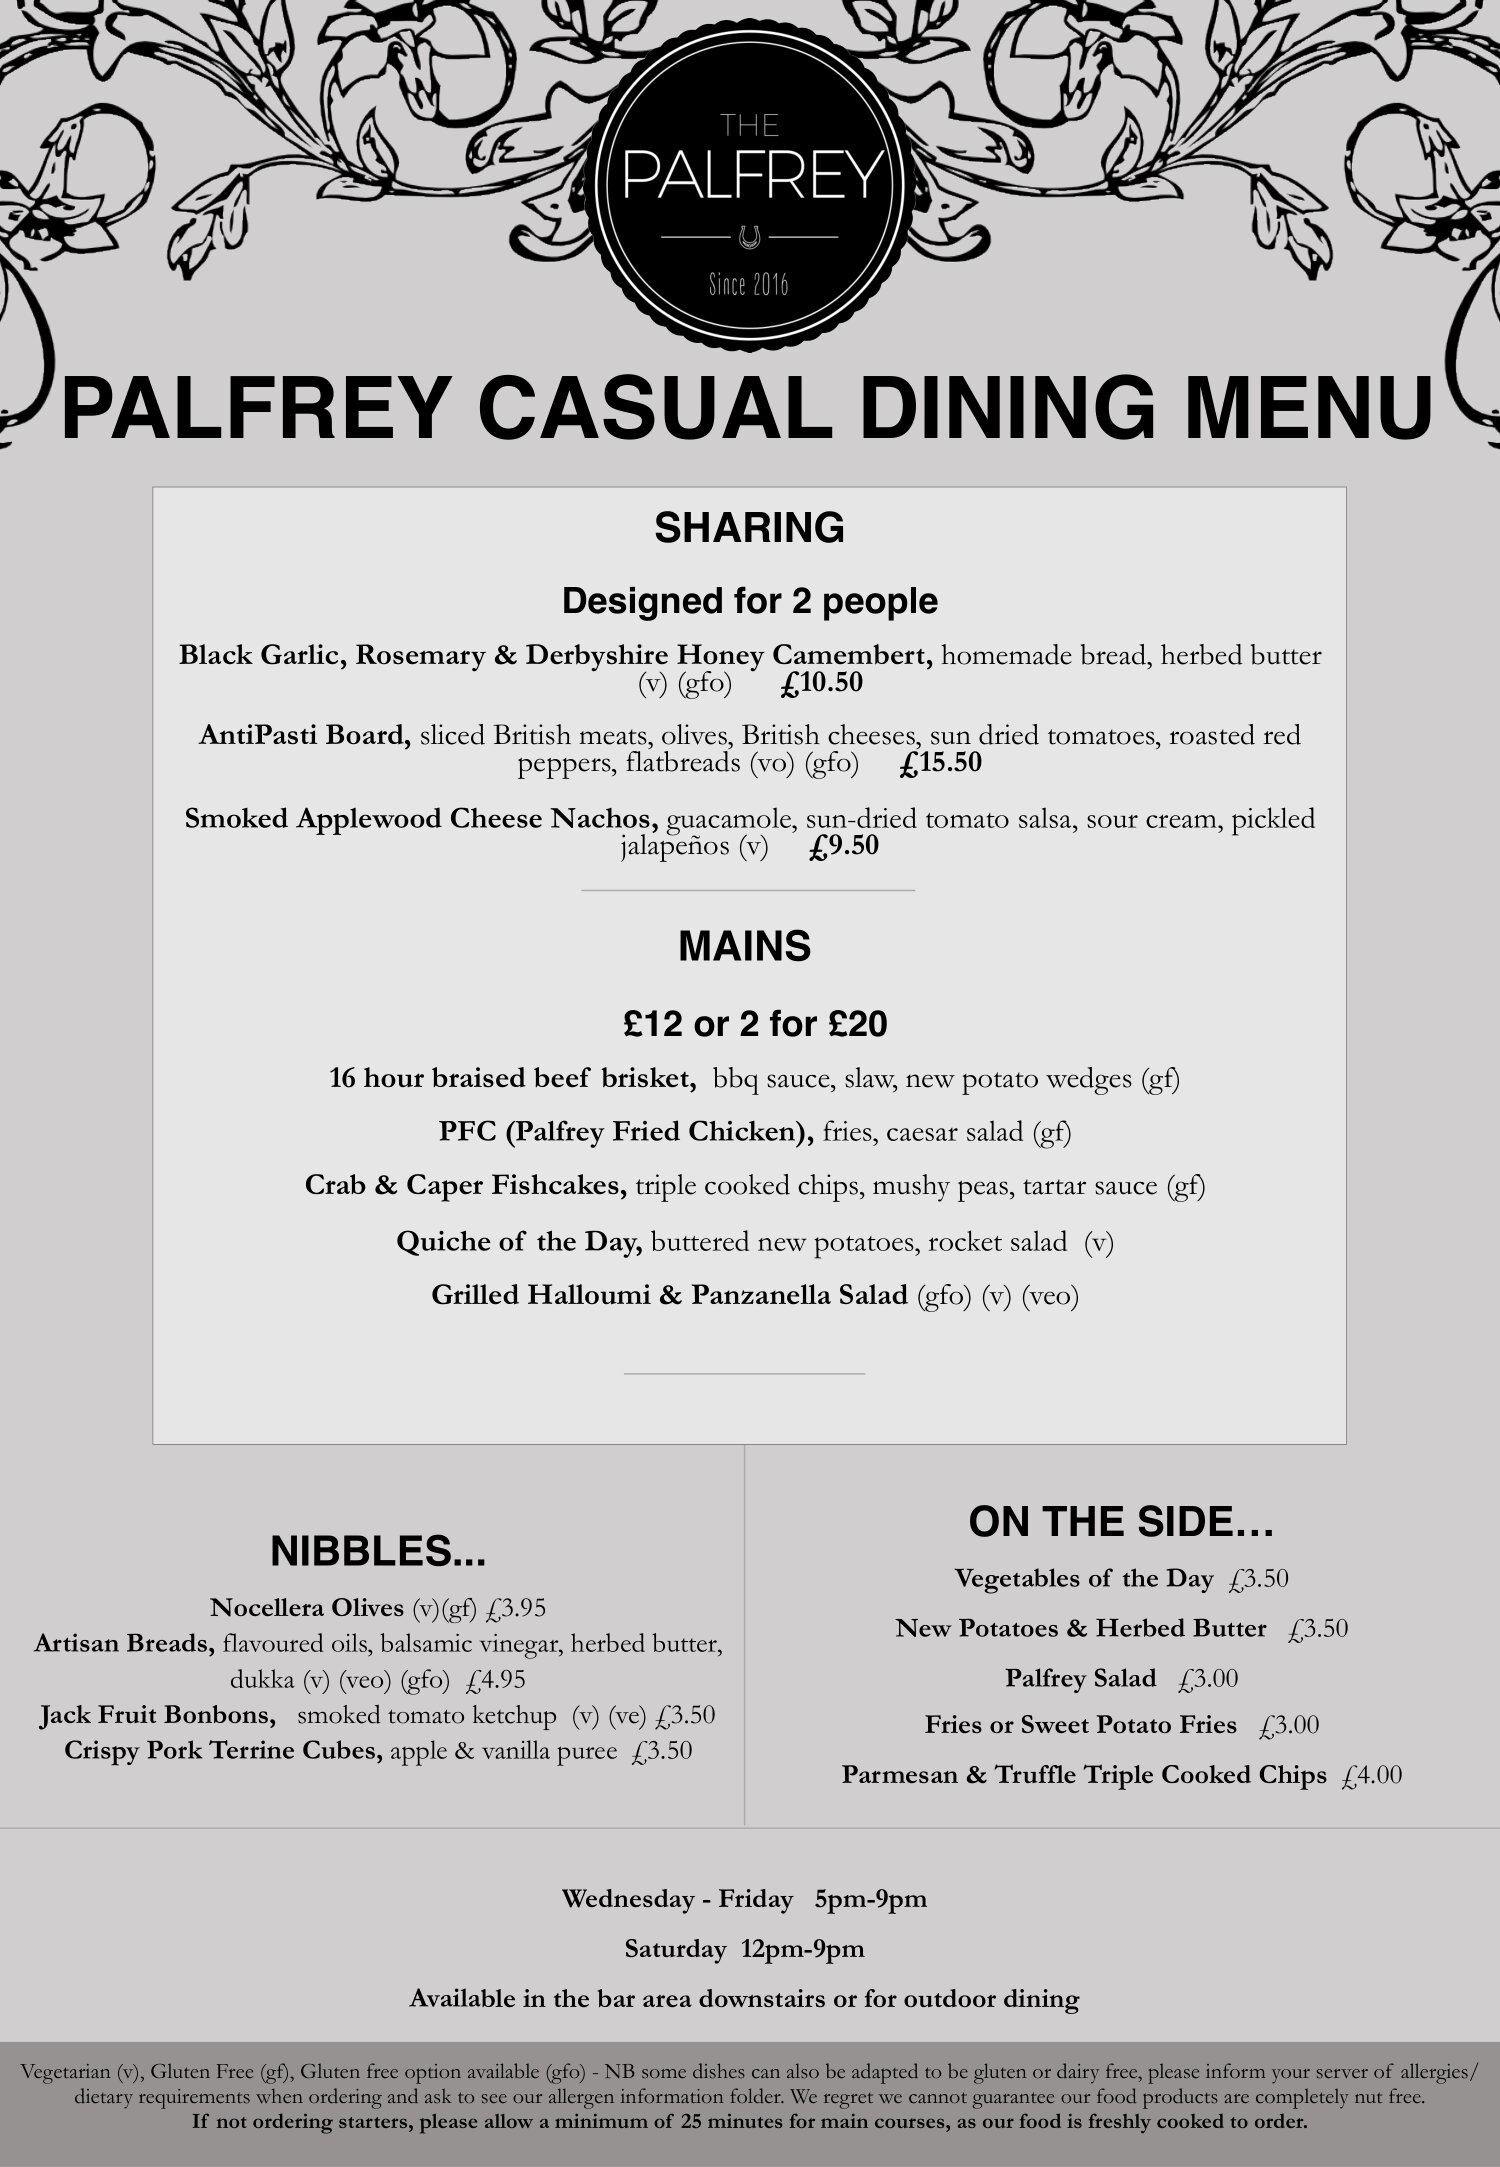 Palfrey Casual Dining Menu - August 2020_1-1